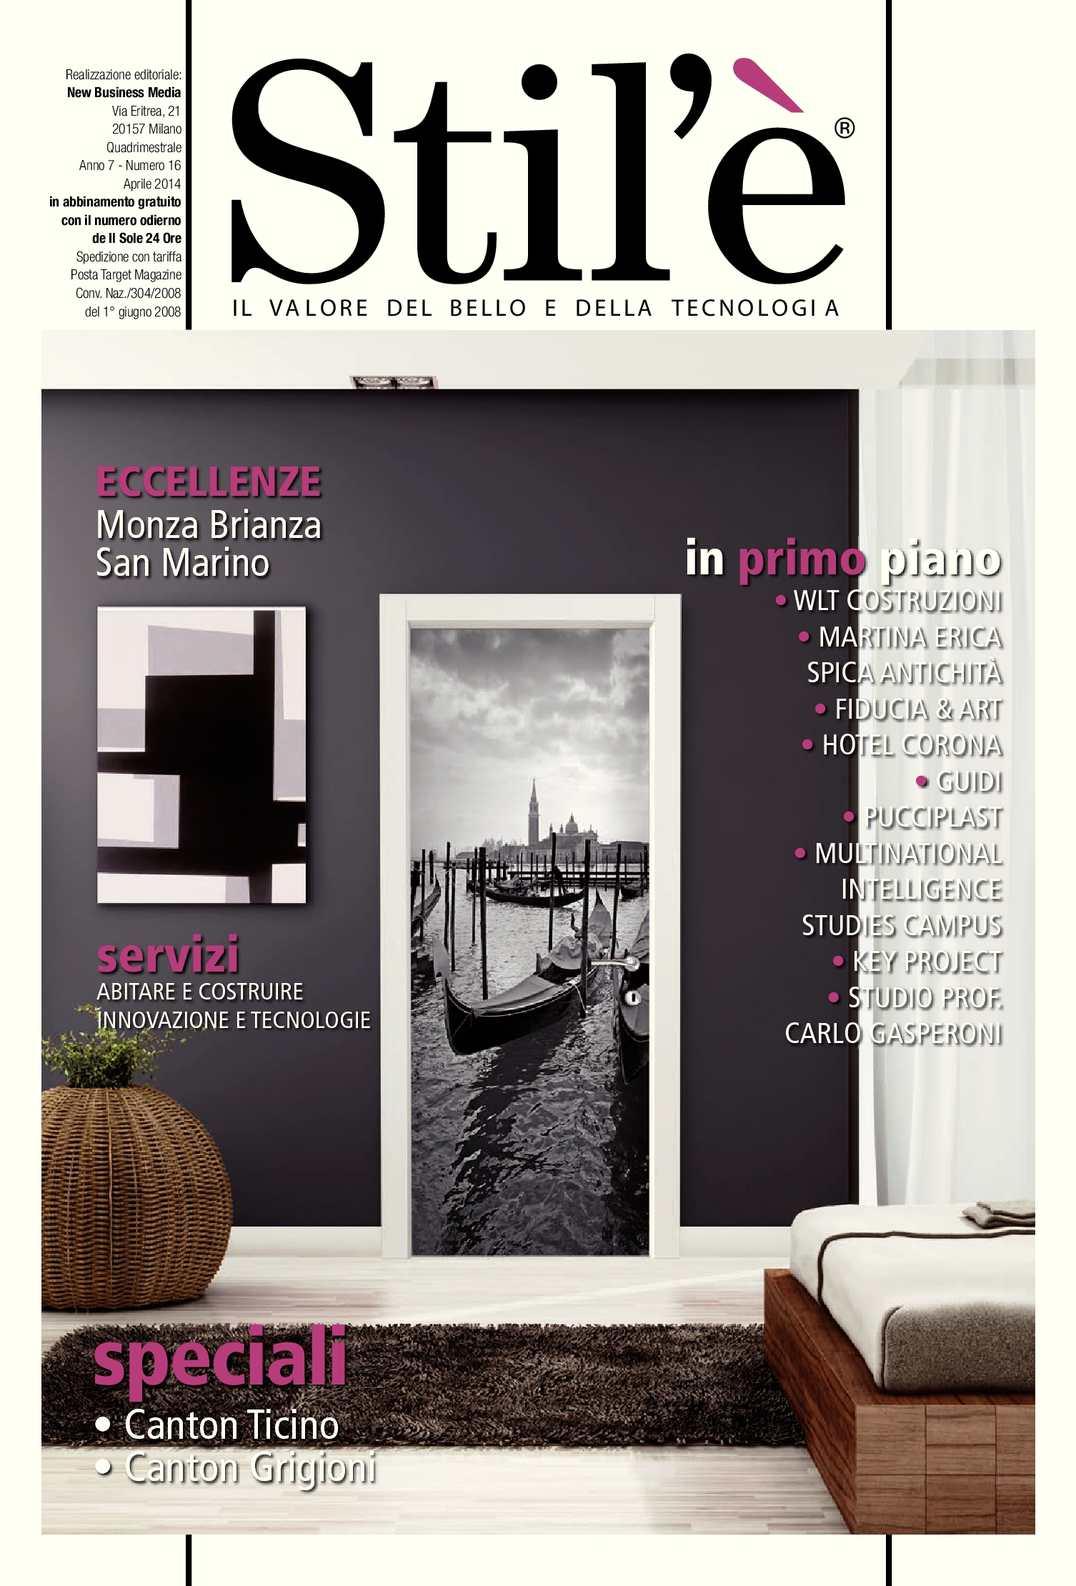 Ceramiche Civita Castellana Erica.Calameo Stil E Magazine Aprile 2014